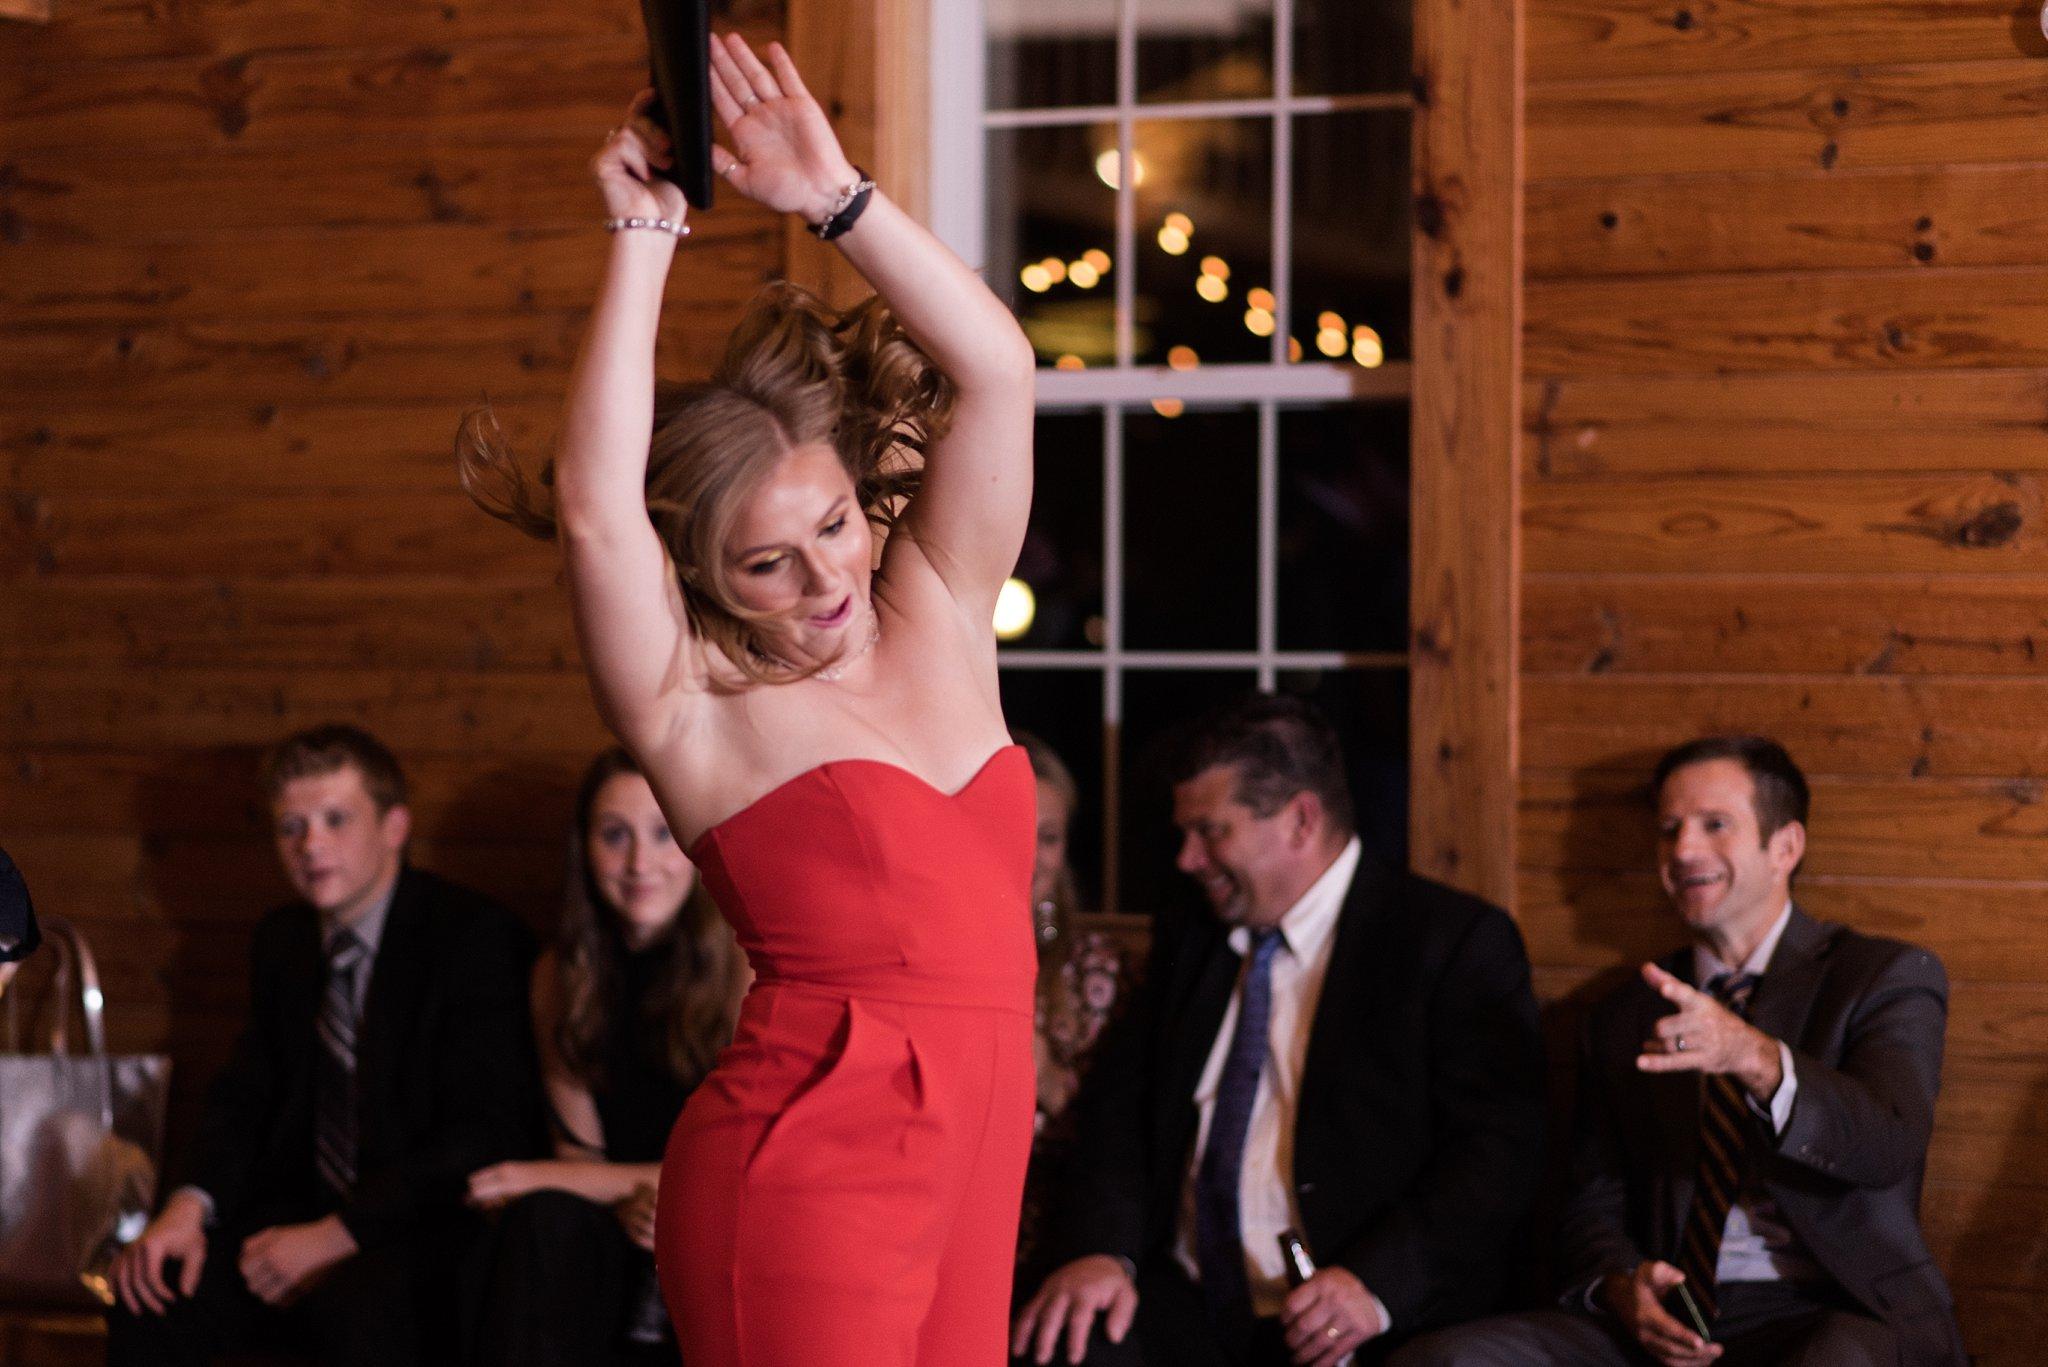 Cadillac-Michigan-wedding-caberfae-peaks-milwaukee-photographer_0101.jpg